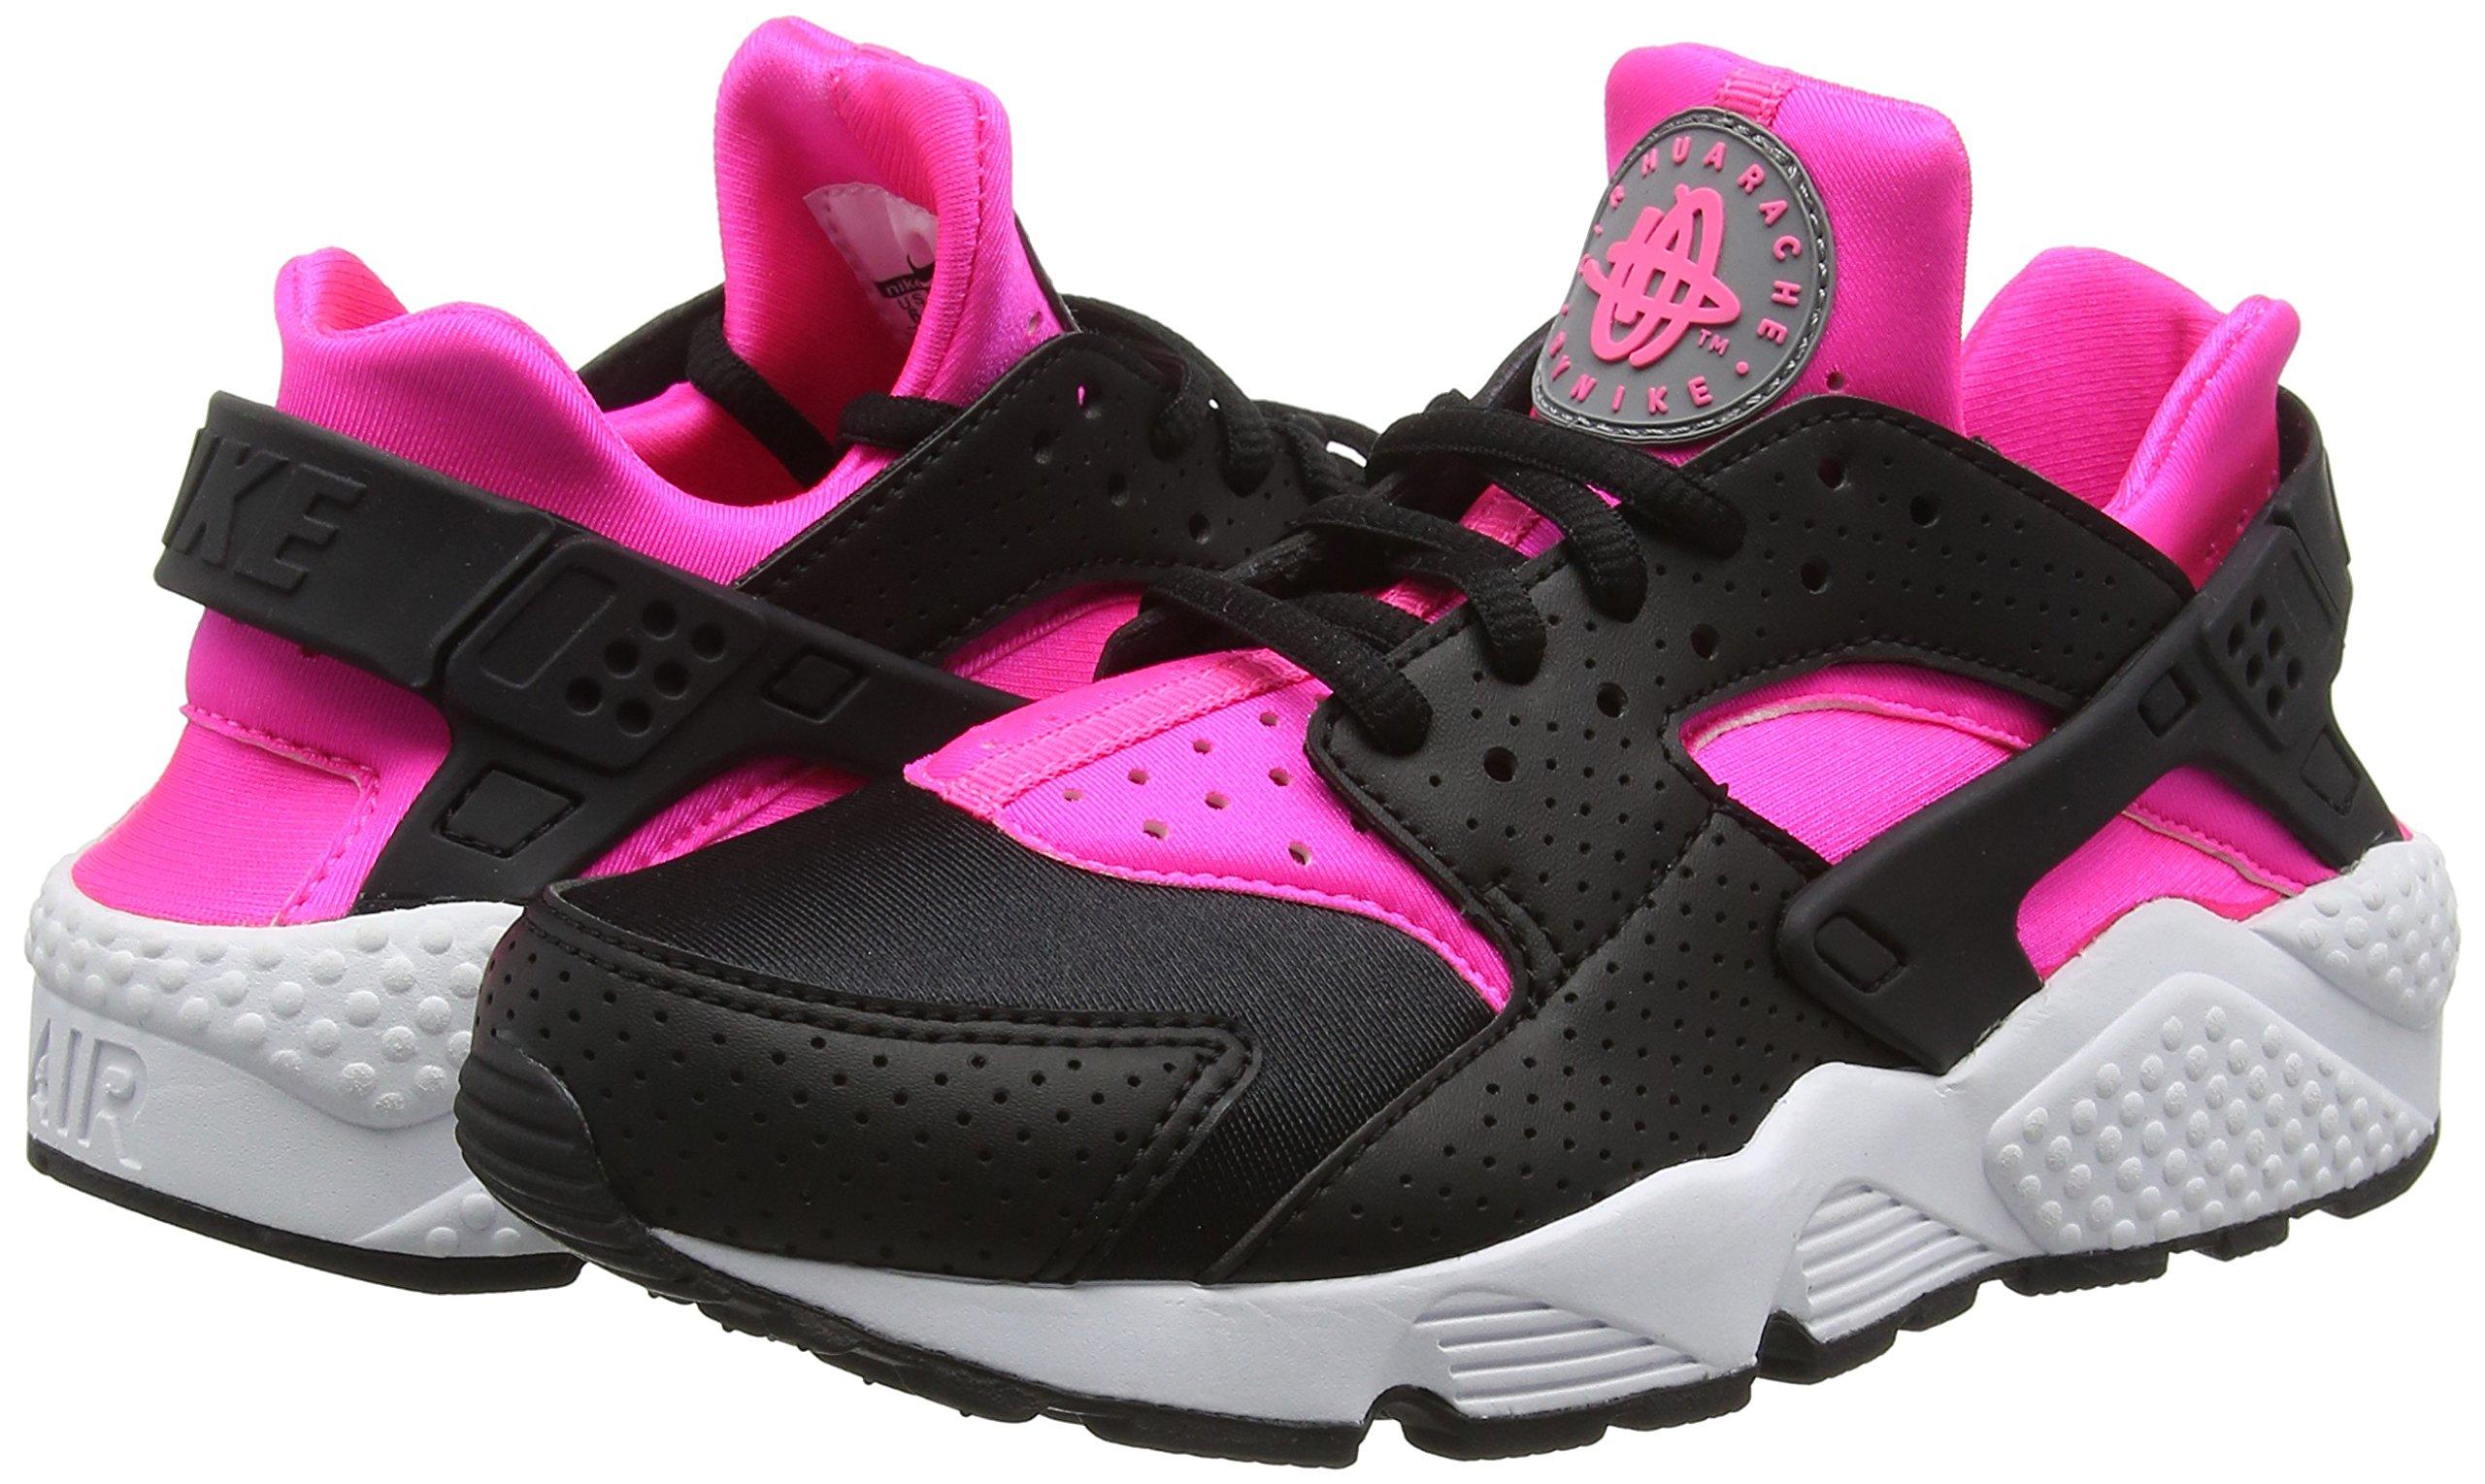 81Ty 65mWZL - Nike Women's Wmns Air Huarache Running Shoes